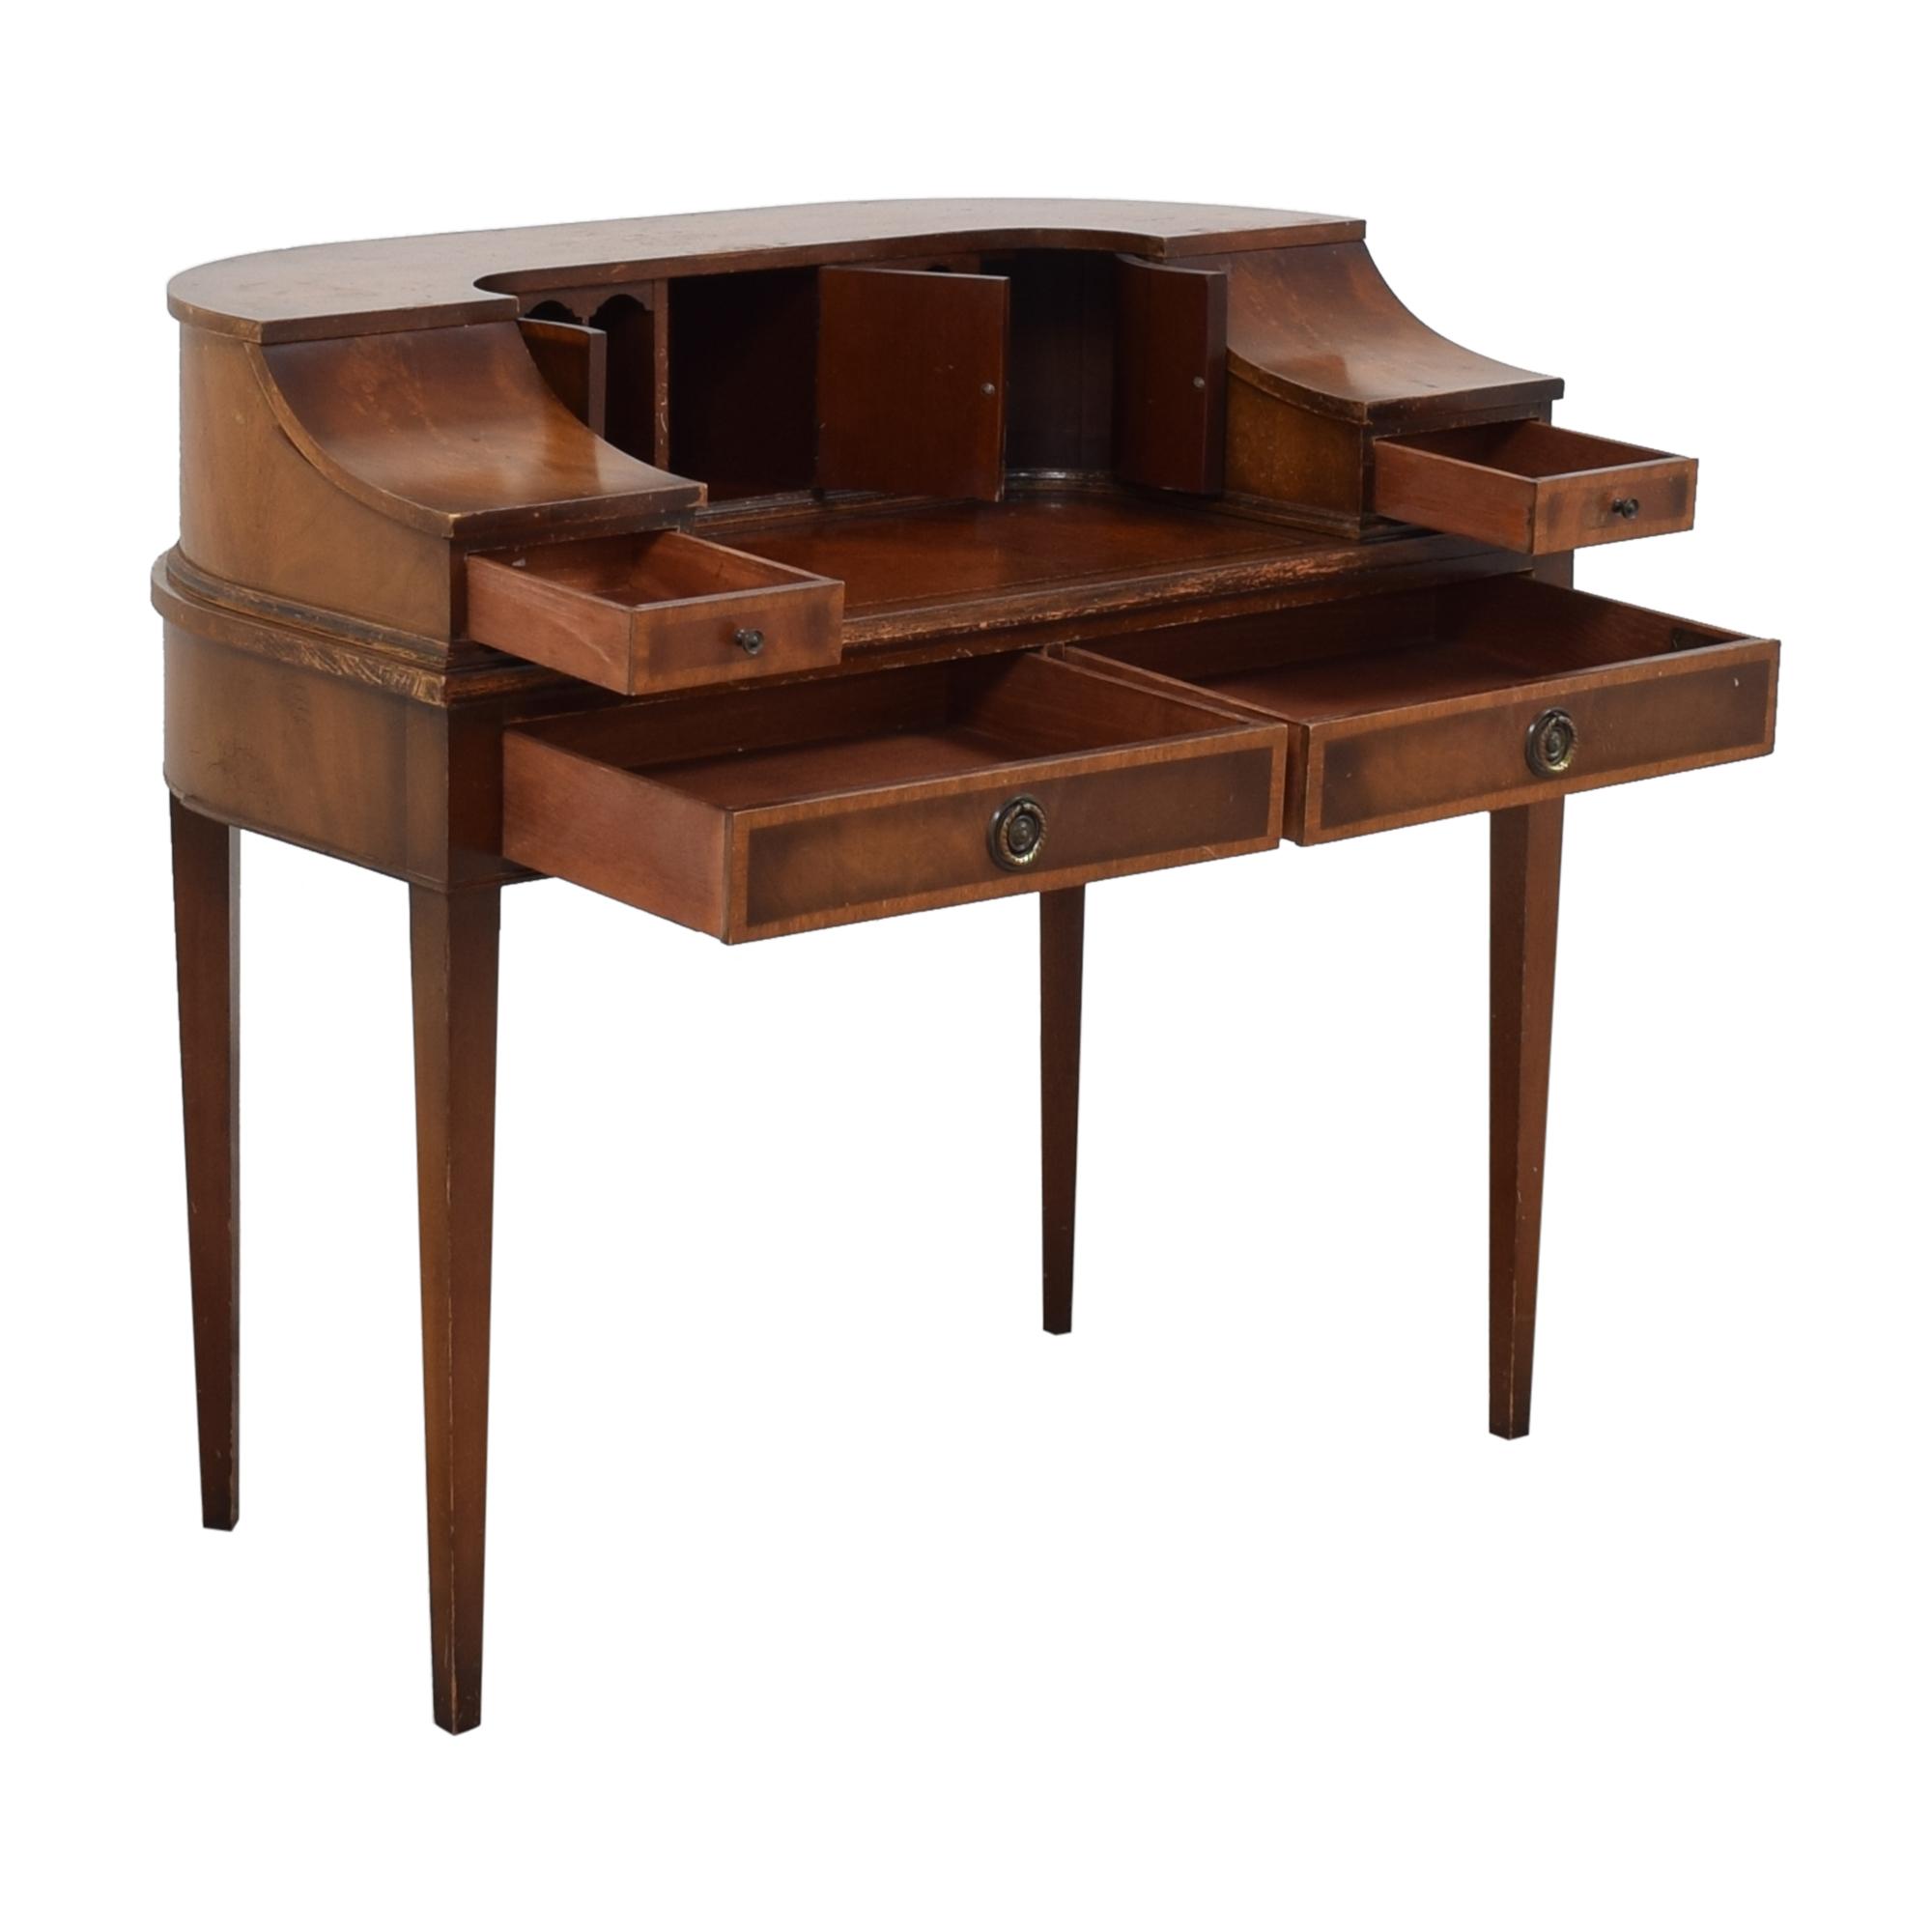 buy Stiehl Furniture Stiehl Furniture Mahogany Secretary Desk online